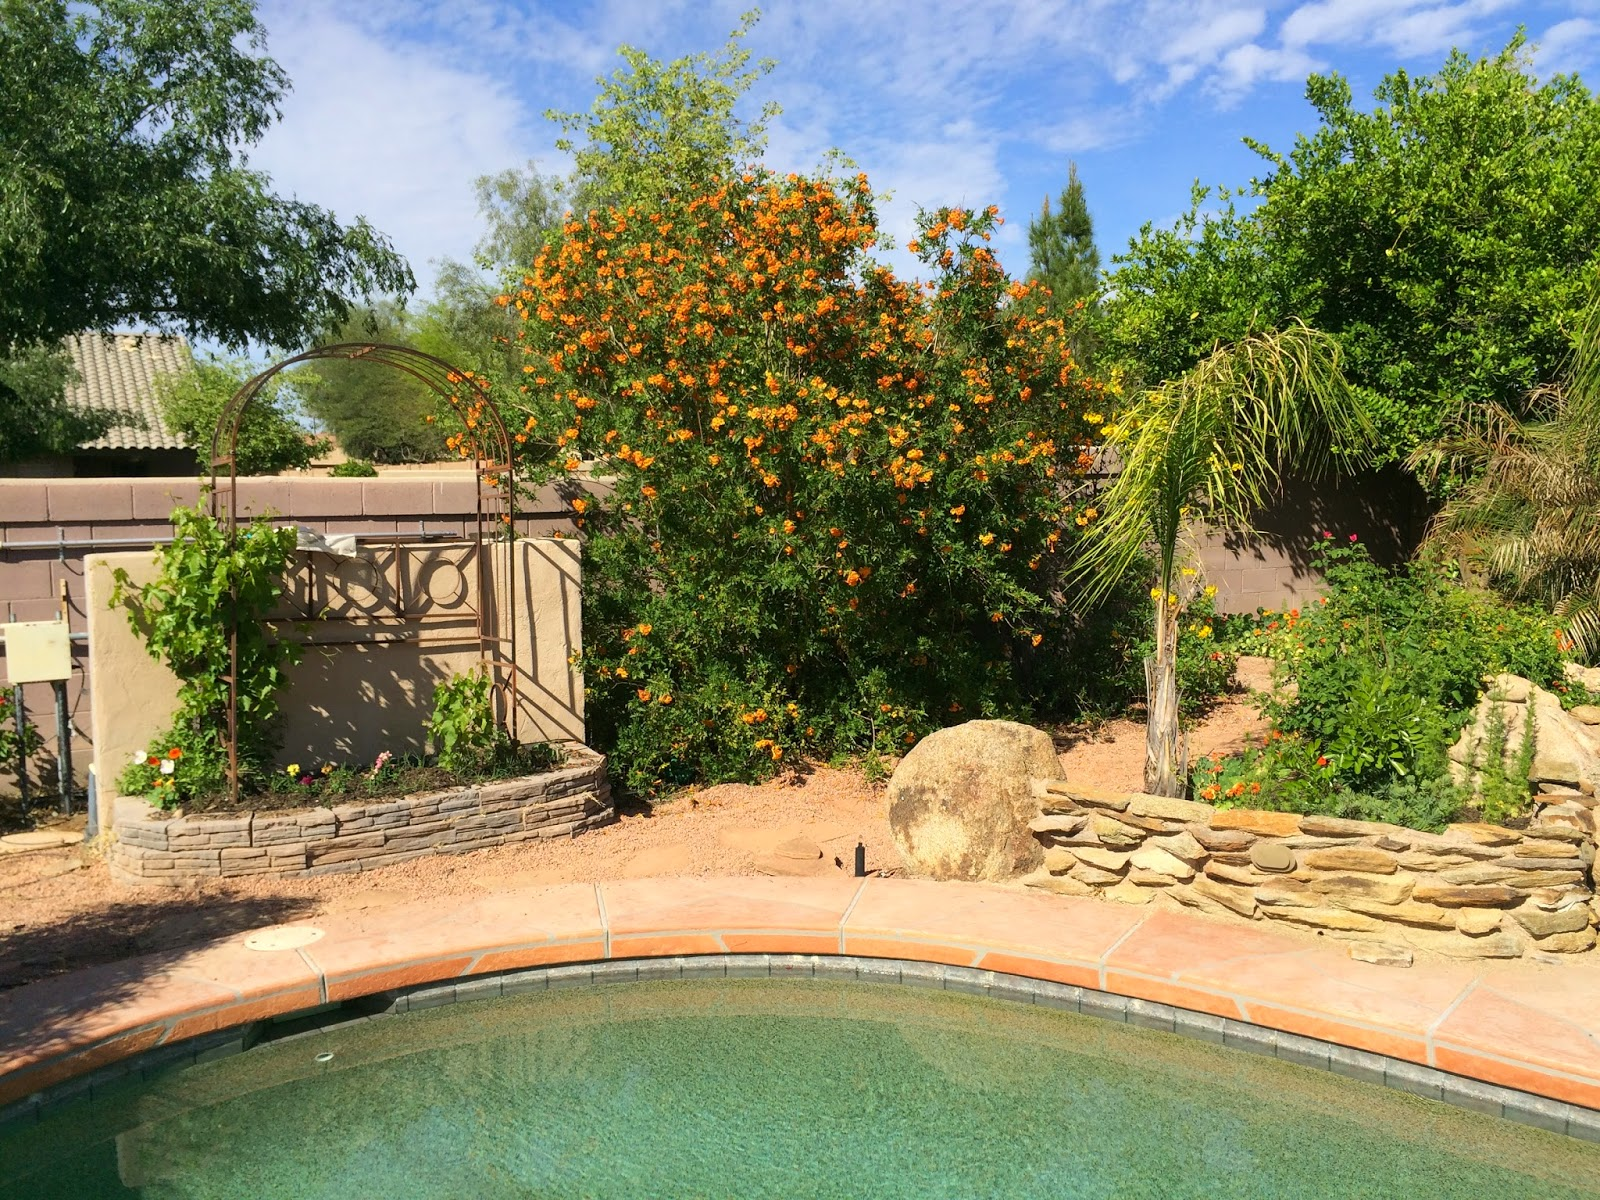 arizona backyard eden is it spring yet